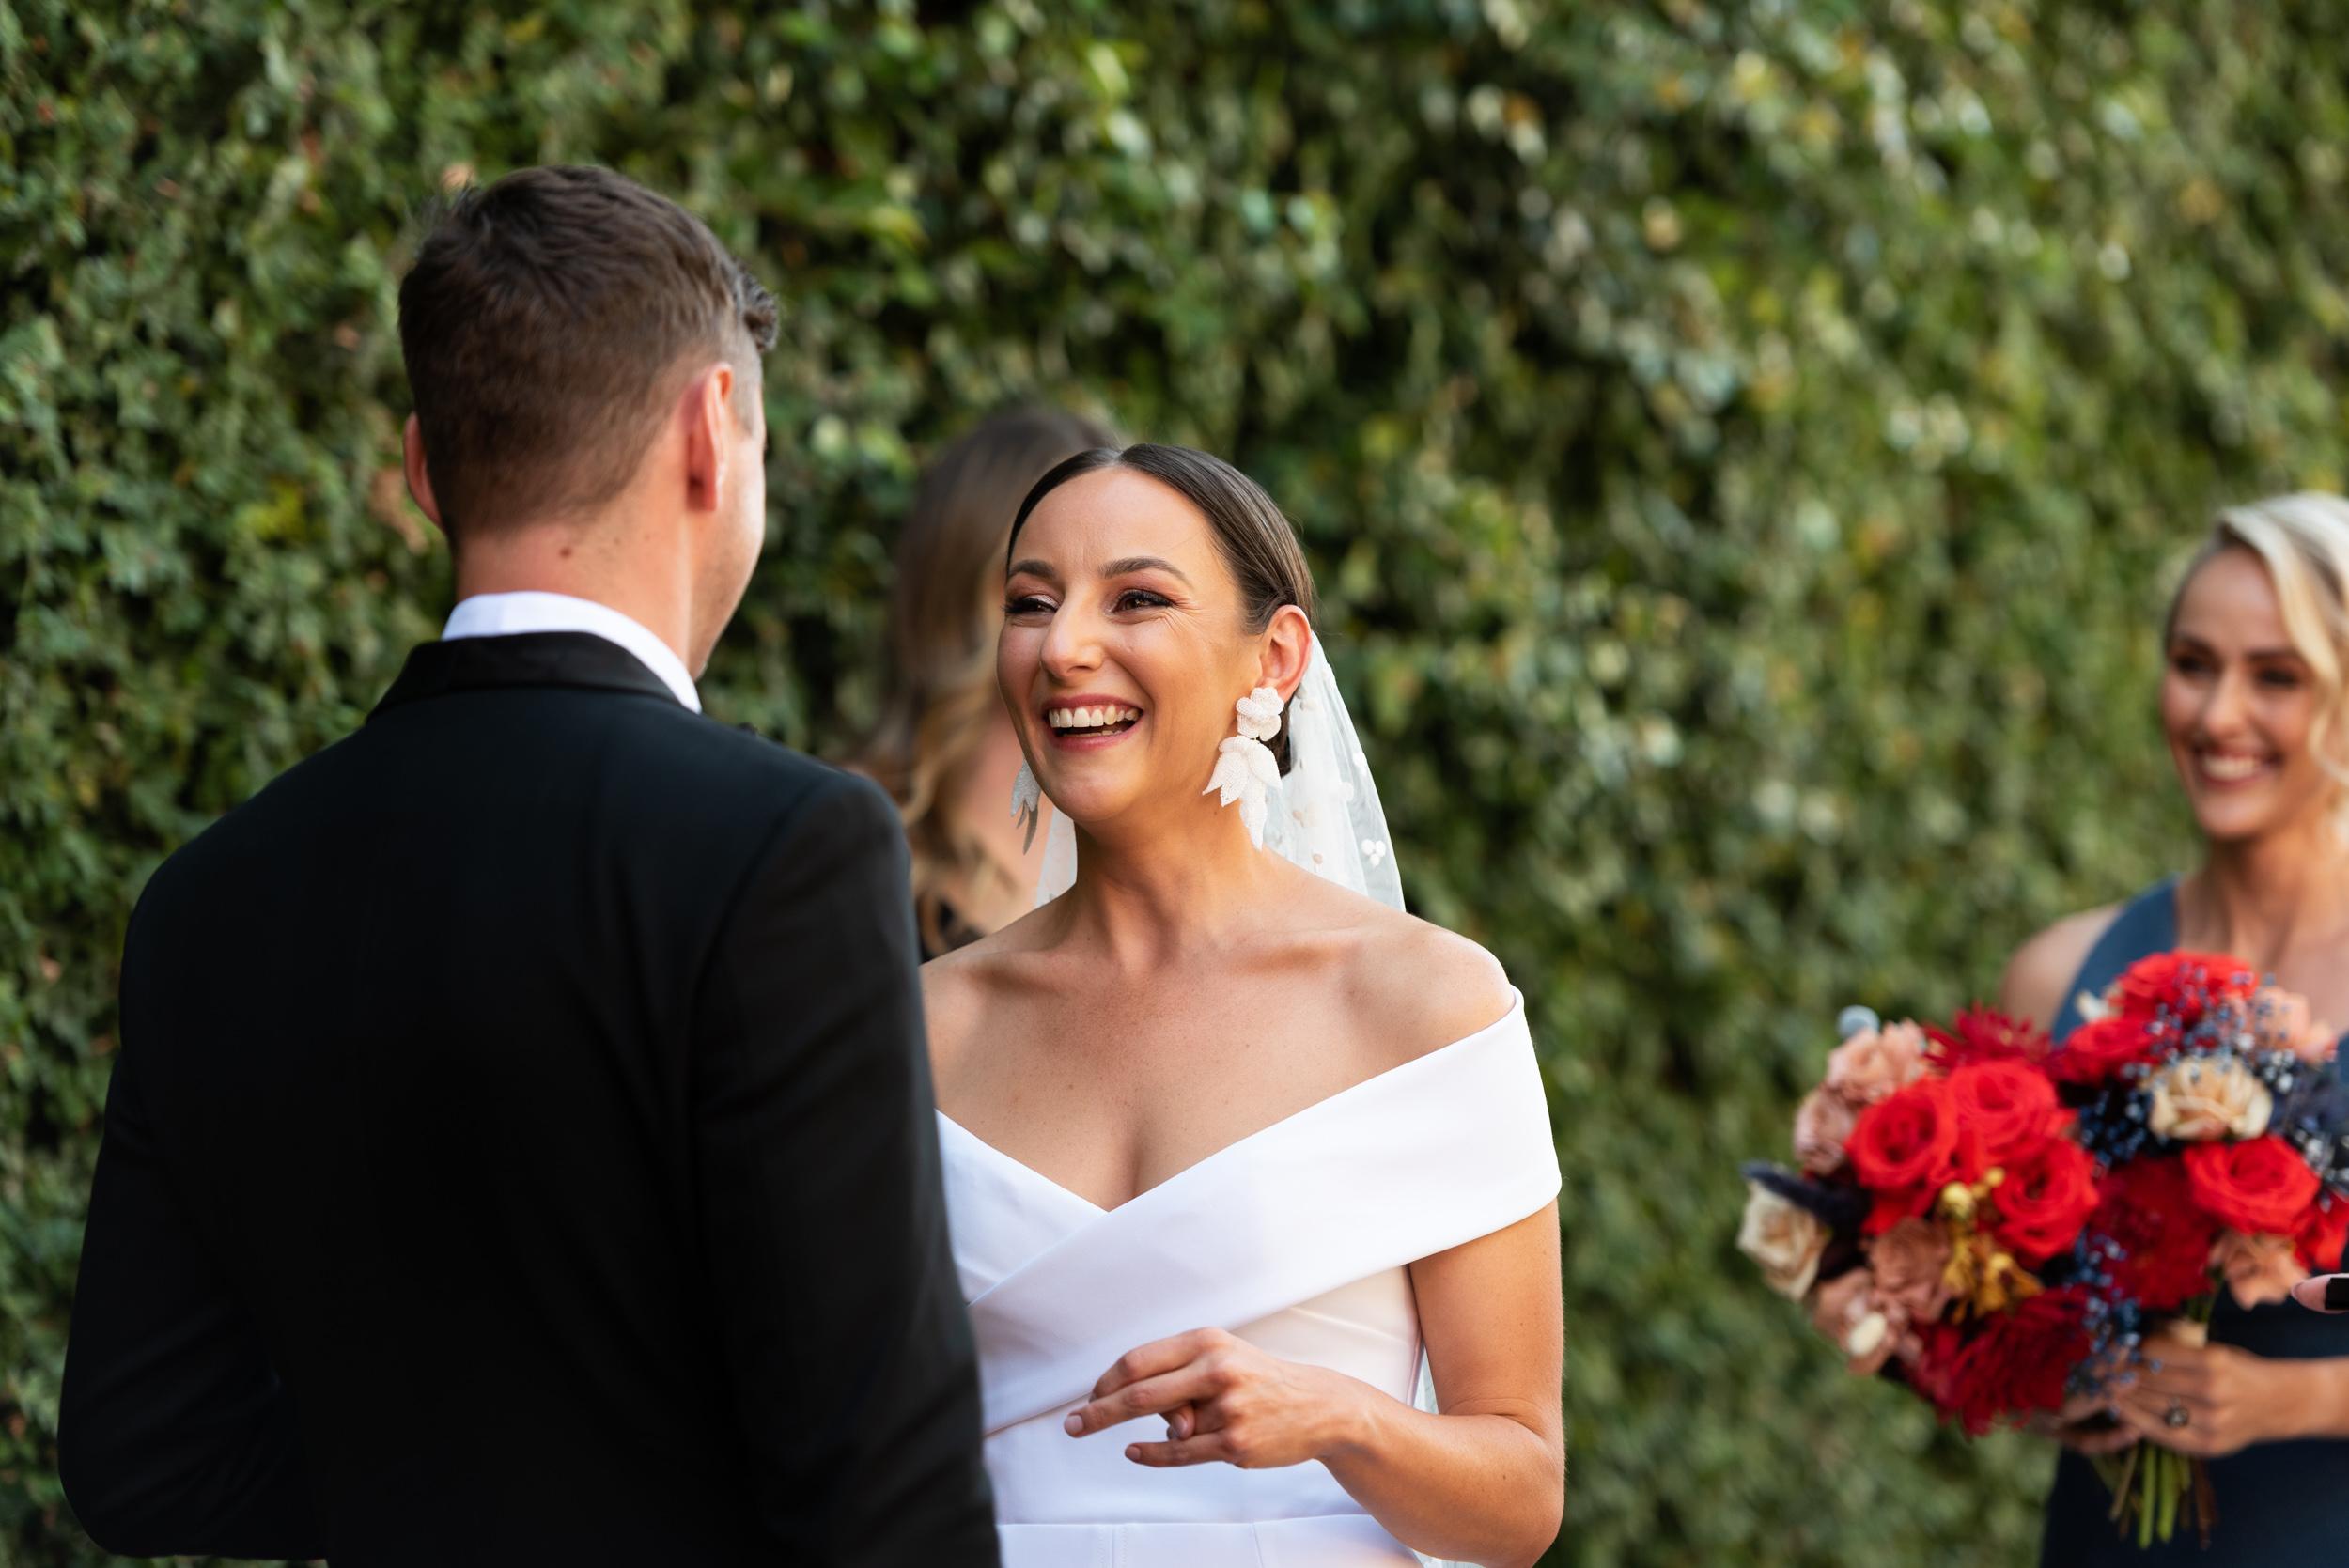 Wedding, Wedding Day, Wedding Ceremony, Butler Lane Richmond, Bride, Happy, Love Alfalfa Florals